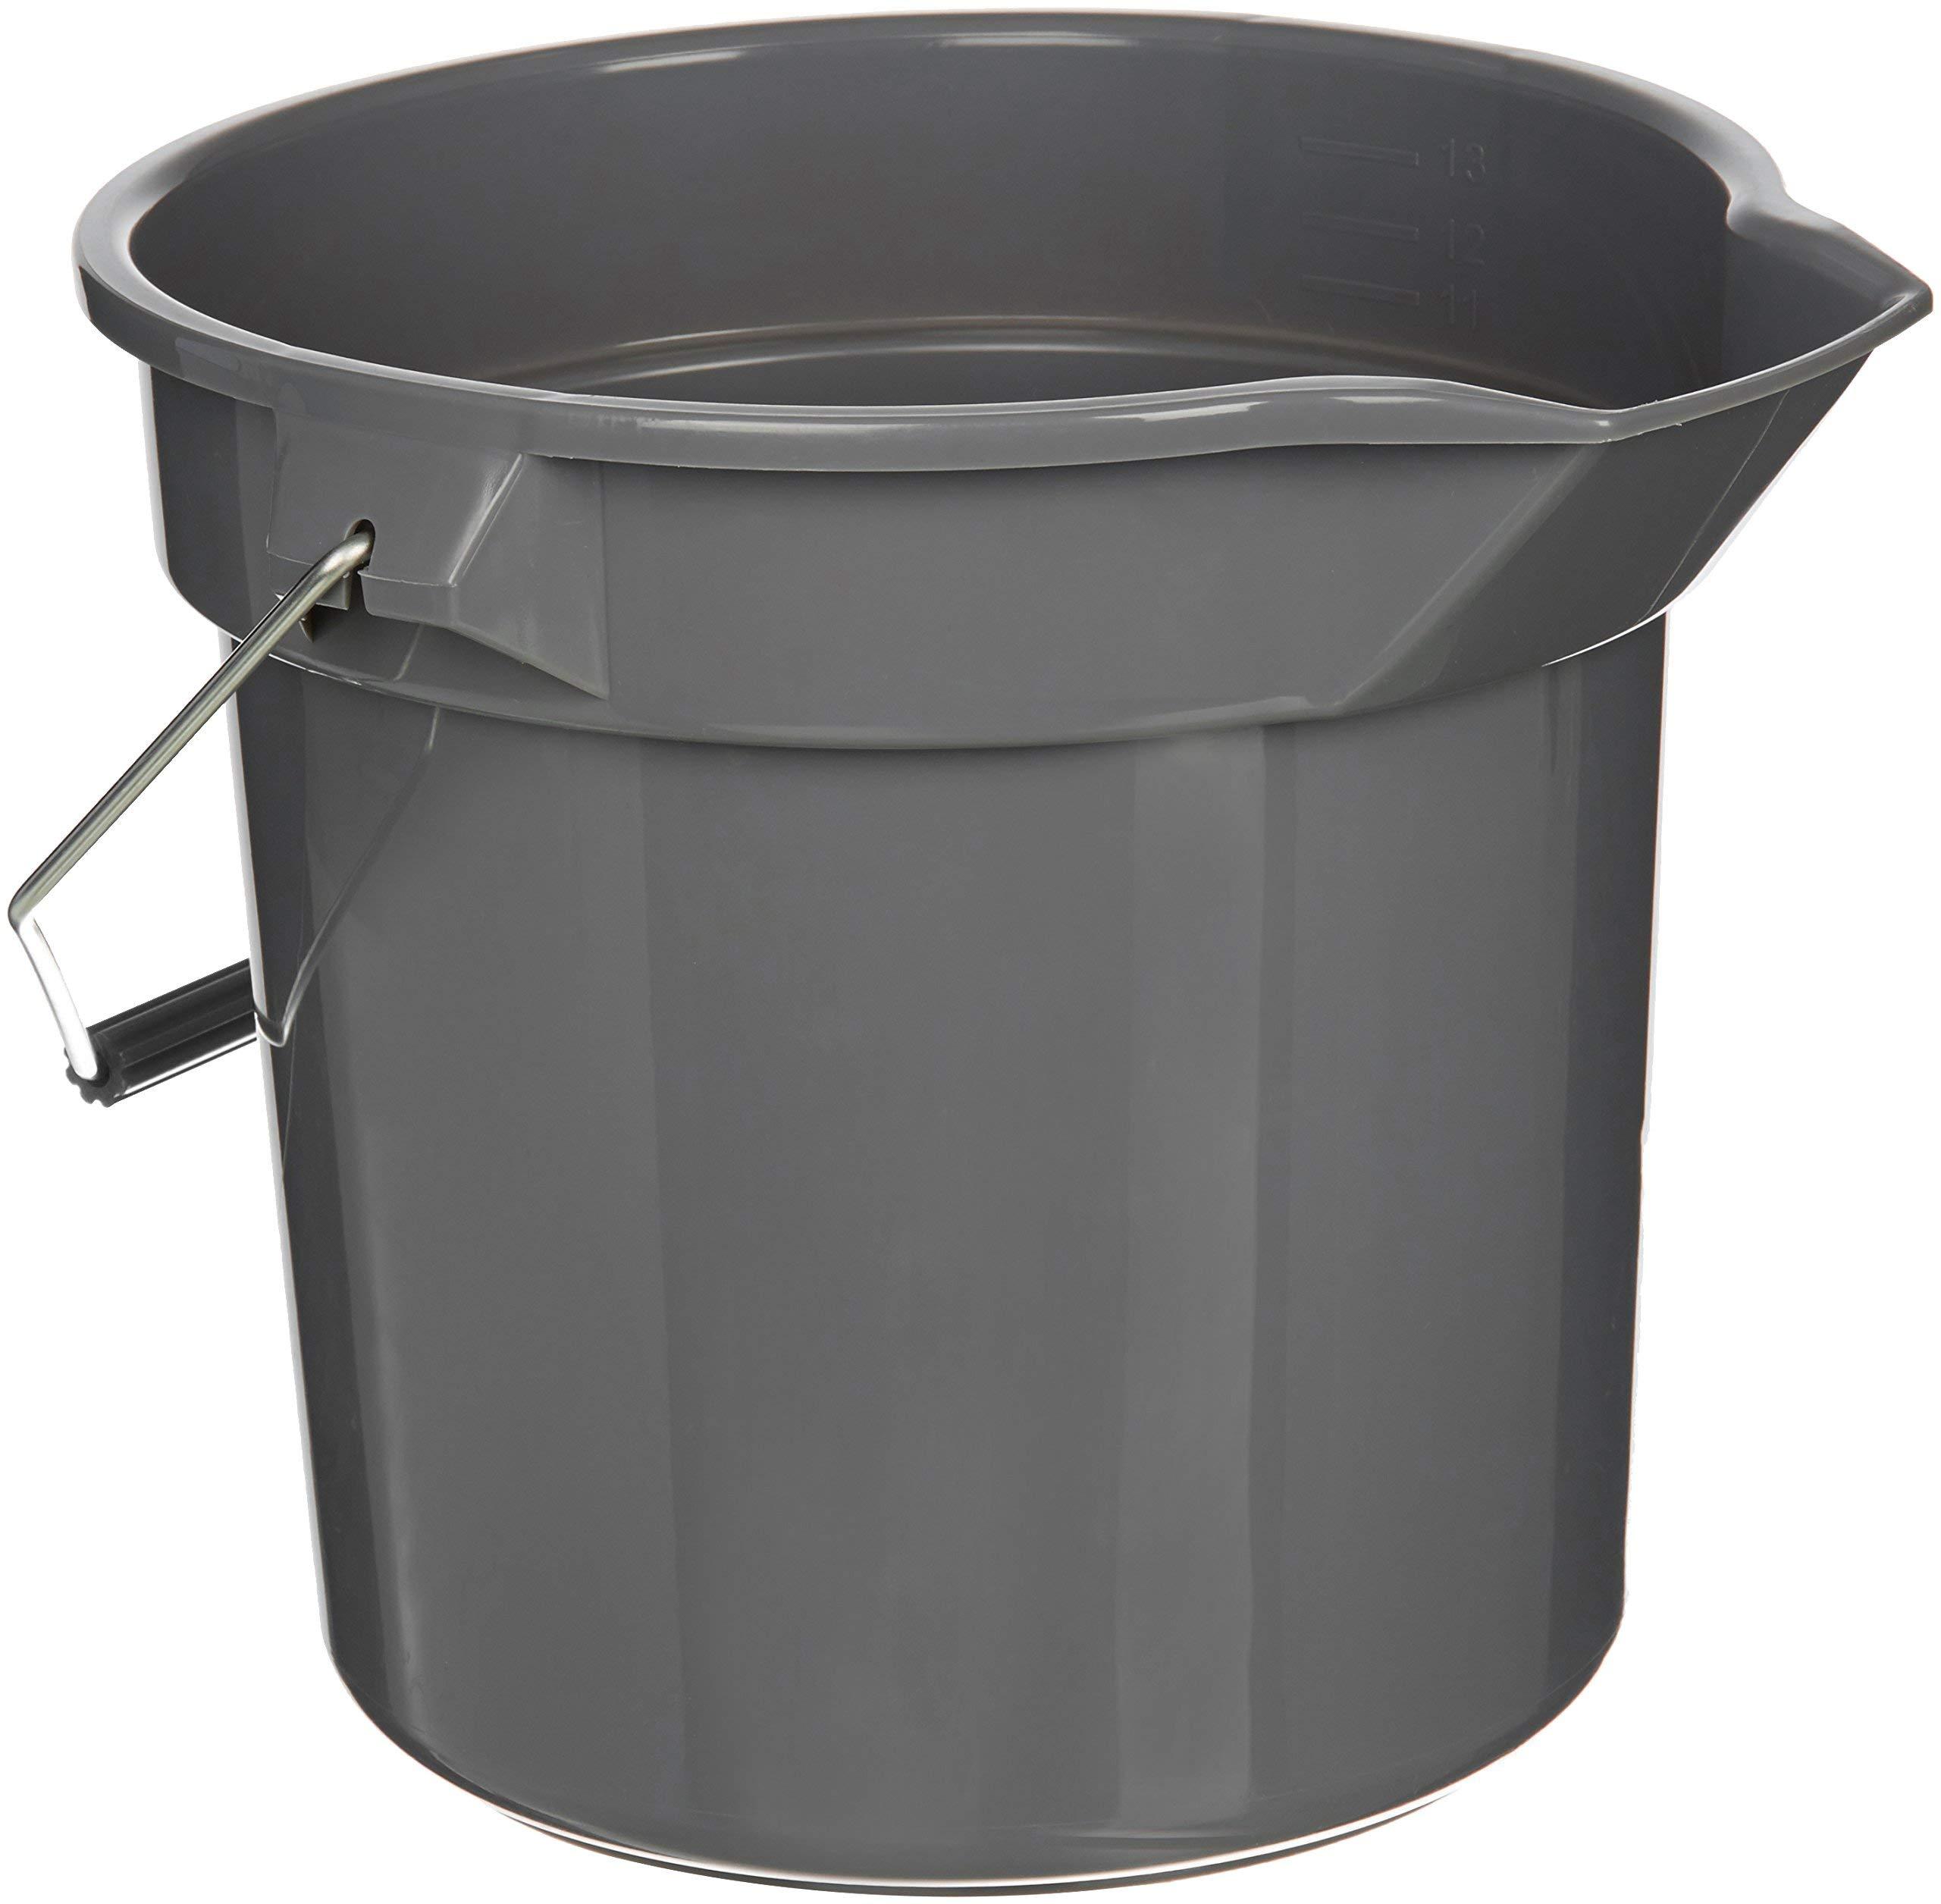 AmazonBasics 14 Quart Plastic Cleaning Bucket, Grey - 6-Pack (Renewed)